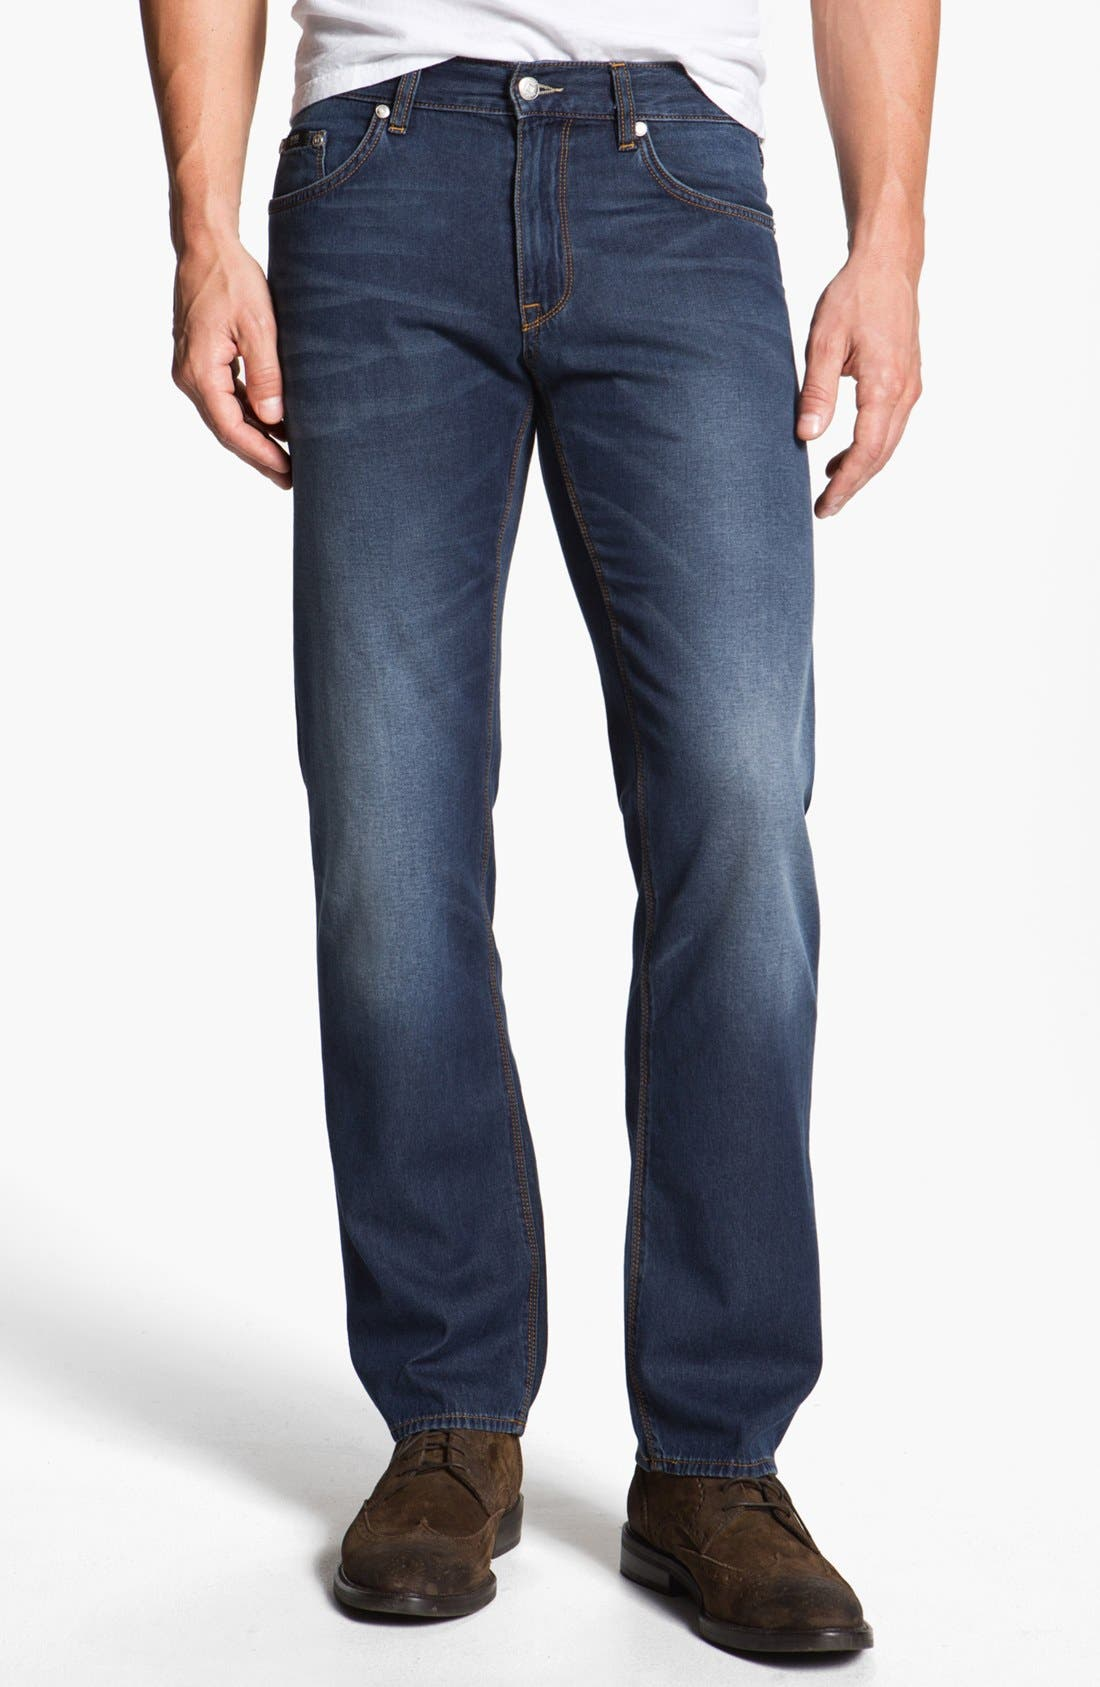 Alternate Image 1 Selected - BOSS HUGO BOSS 'Maine' Straight Leg Jeans (Medium Rinse)